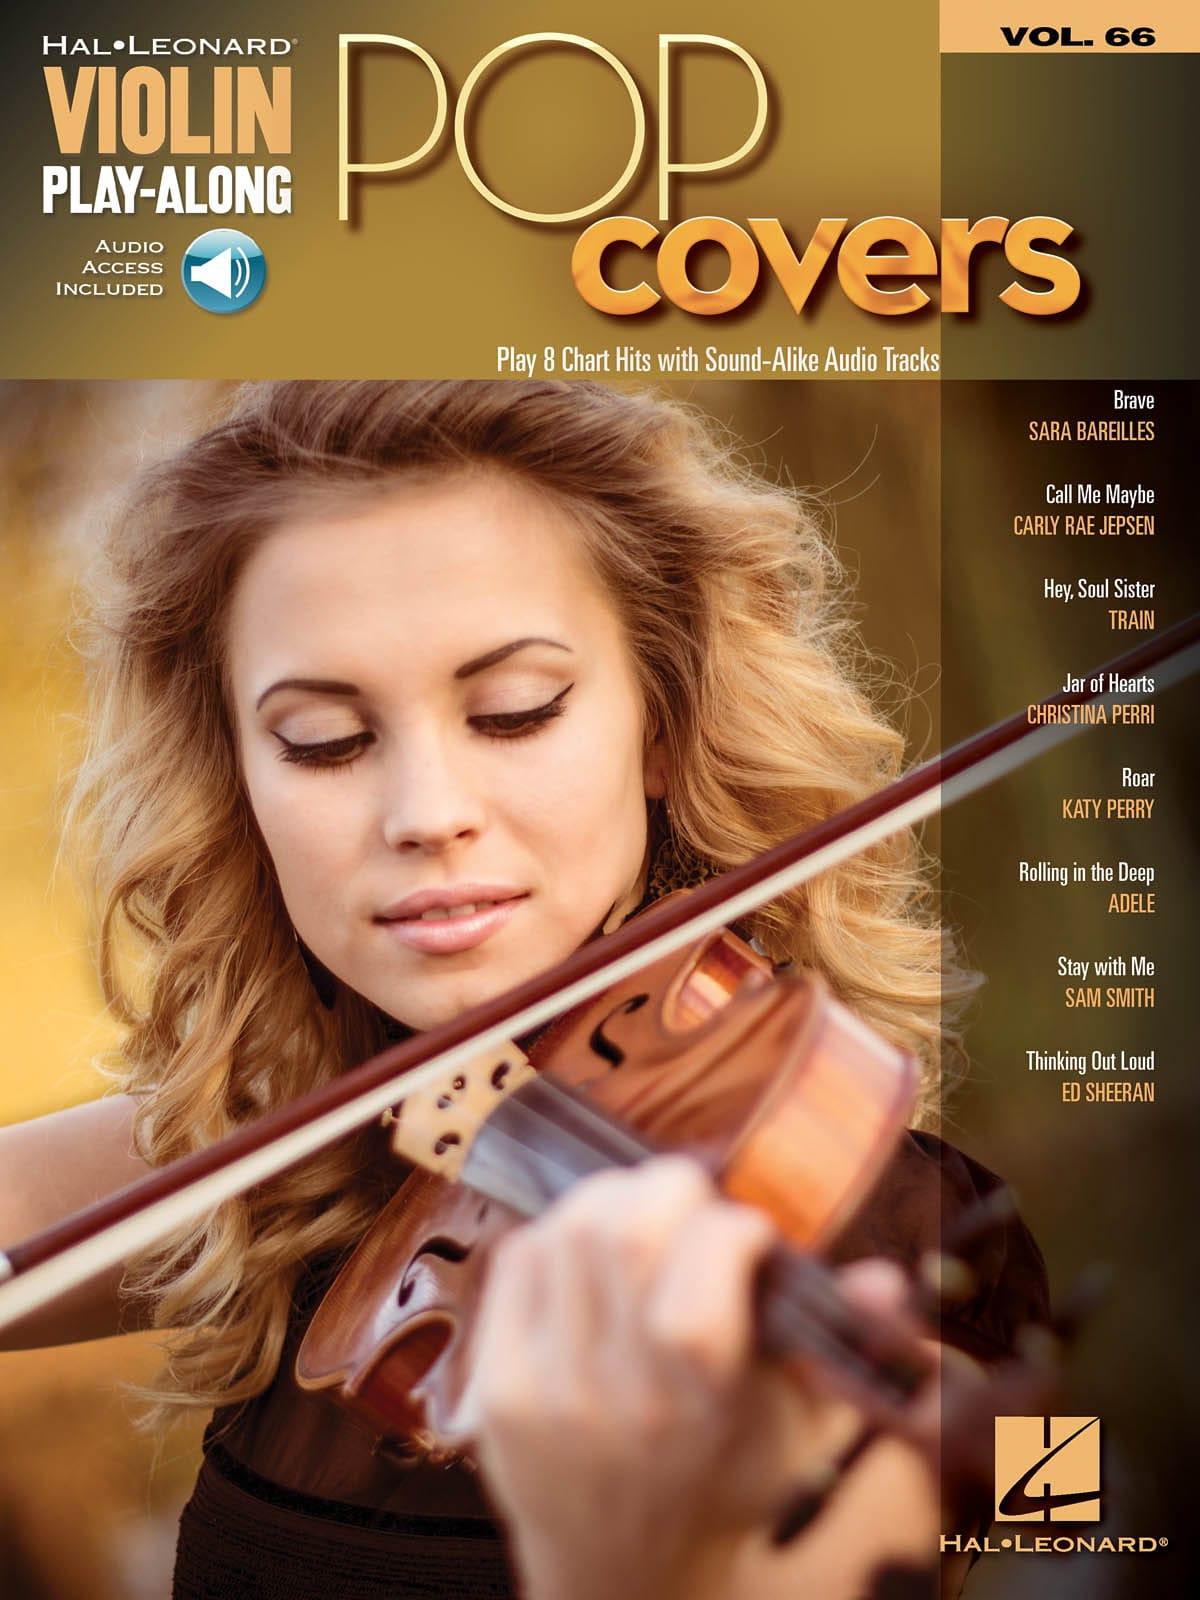 Violin Play-Along Volume 66 - Pop Covers - laflutedepan.com